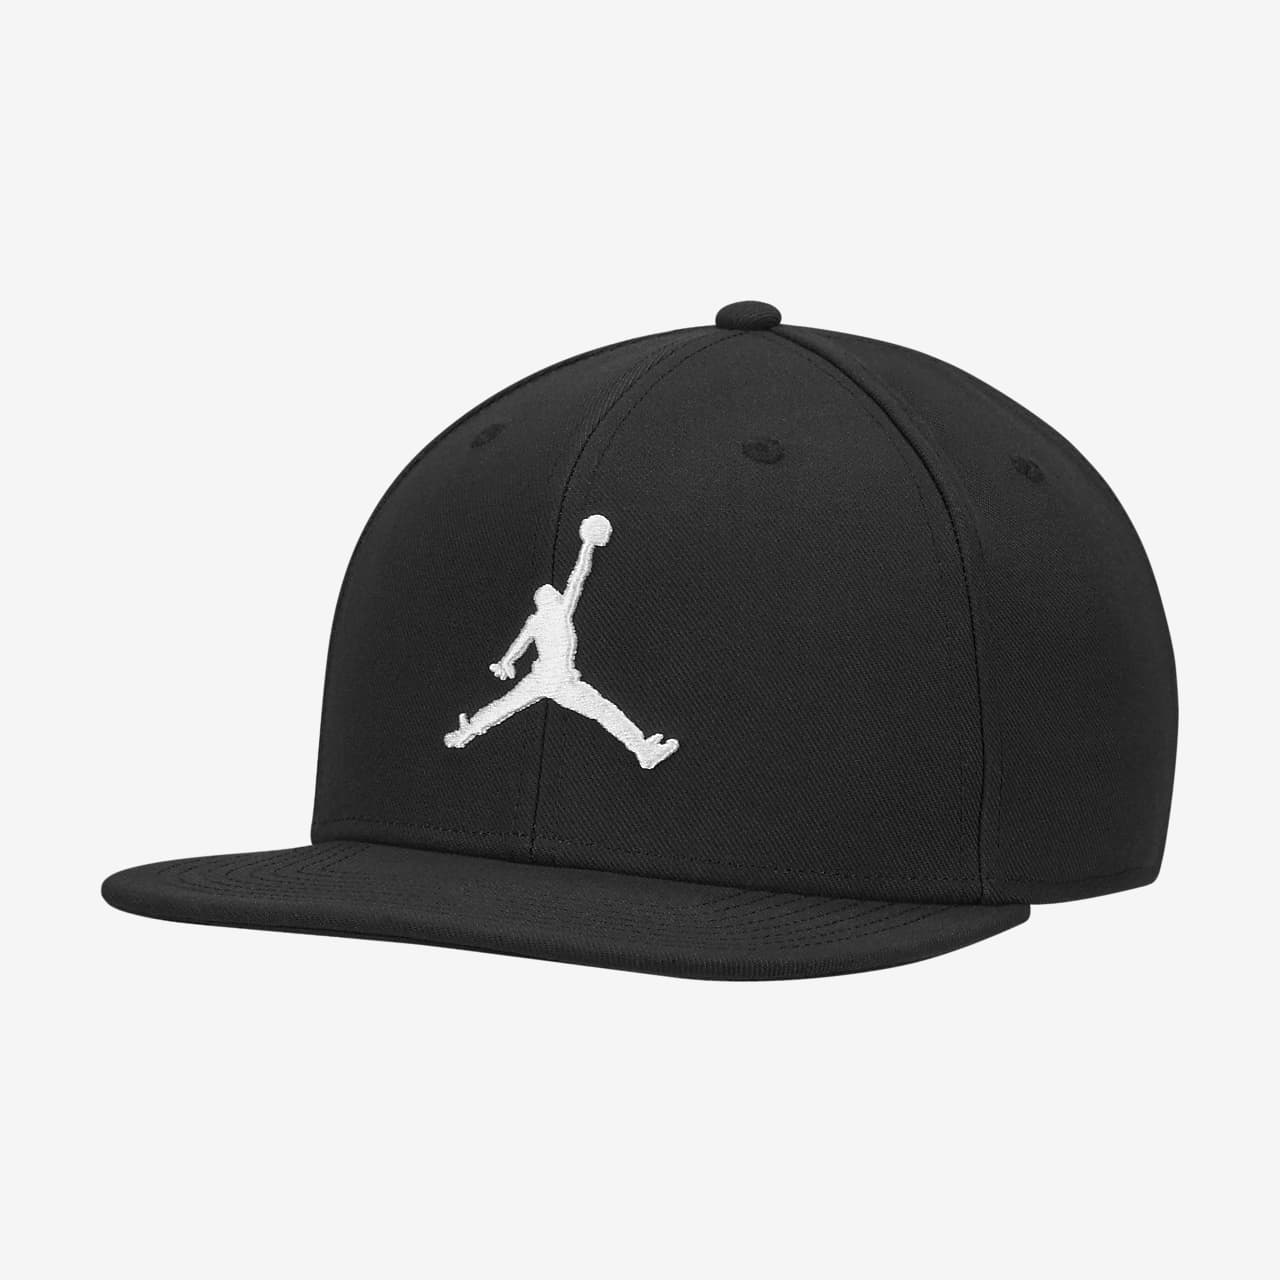 Jordan Pro Jumpman Snapback 帽款